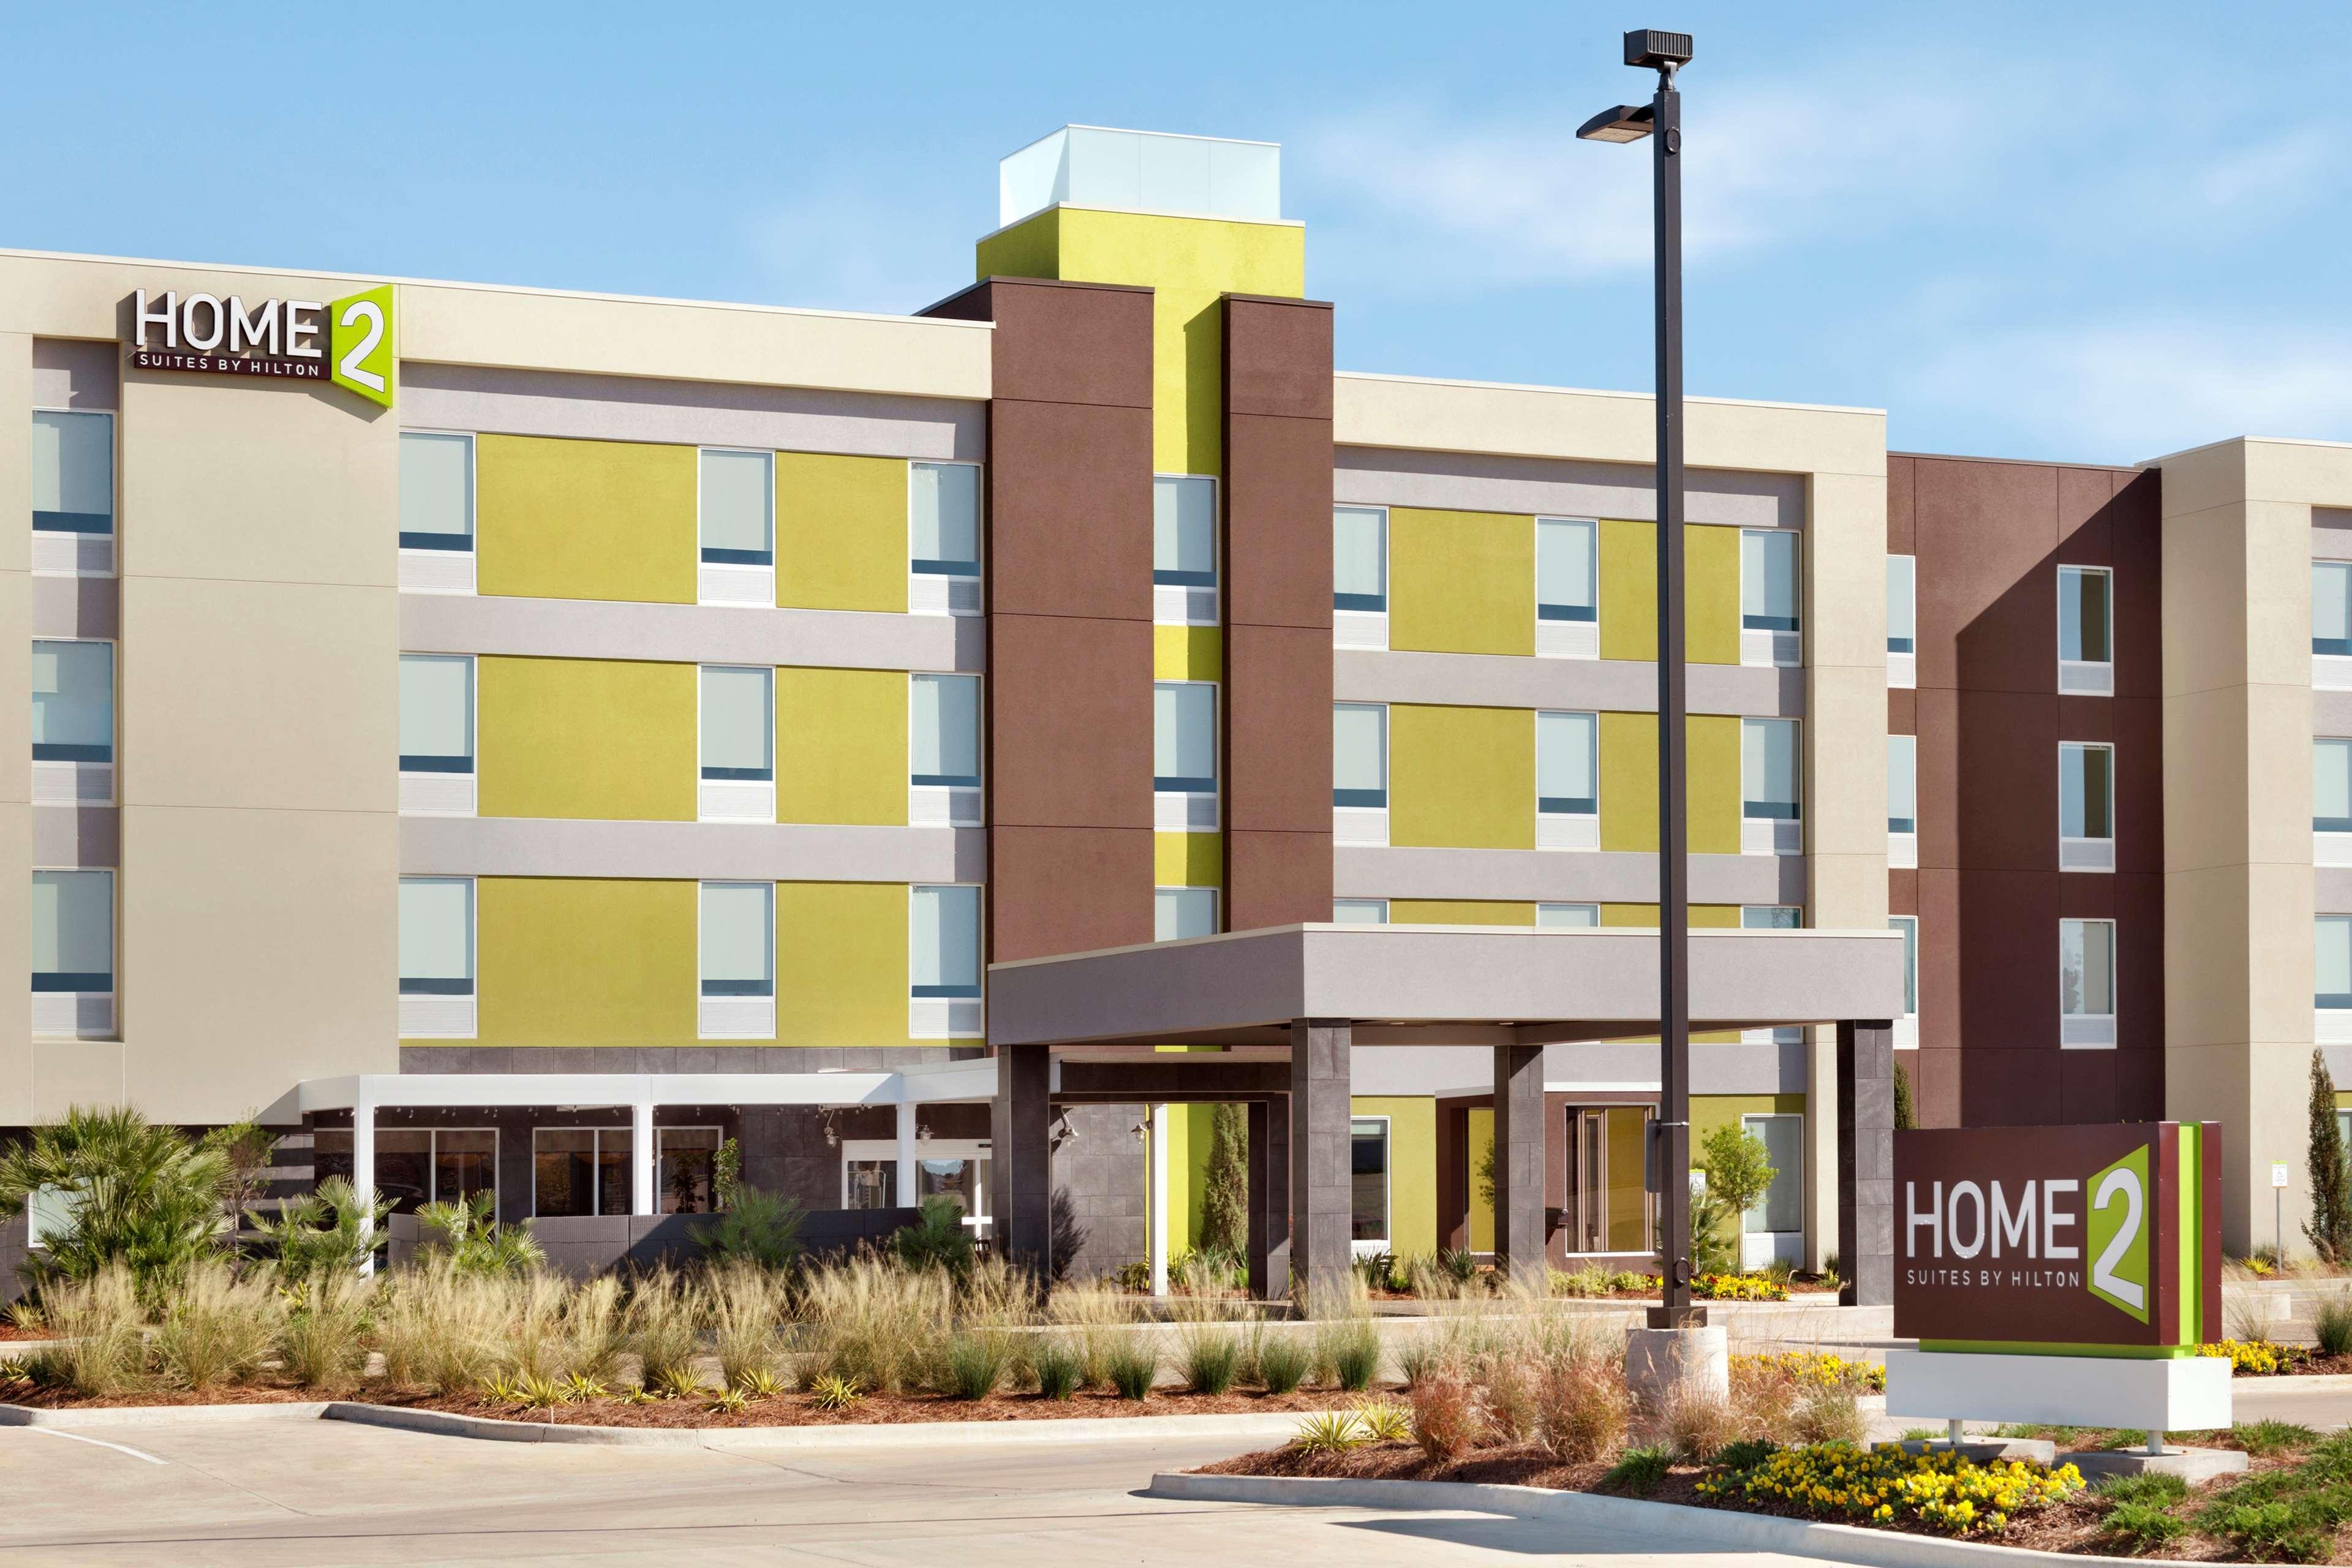 Home2 Suites by Hilton West Monroe image 1